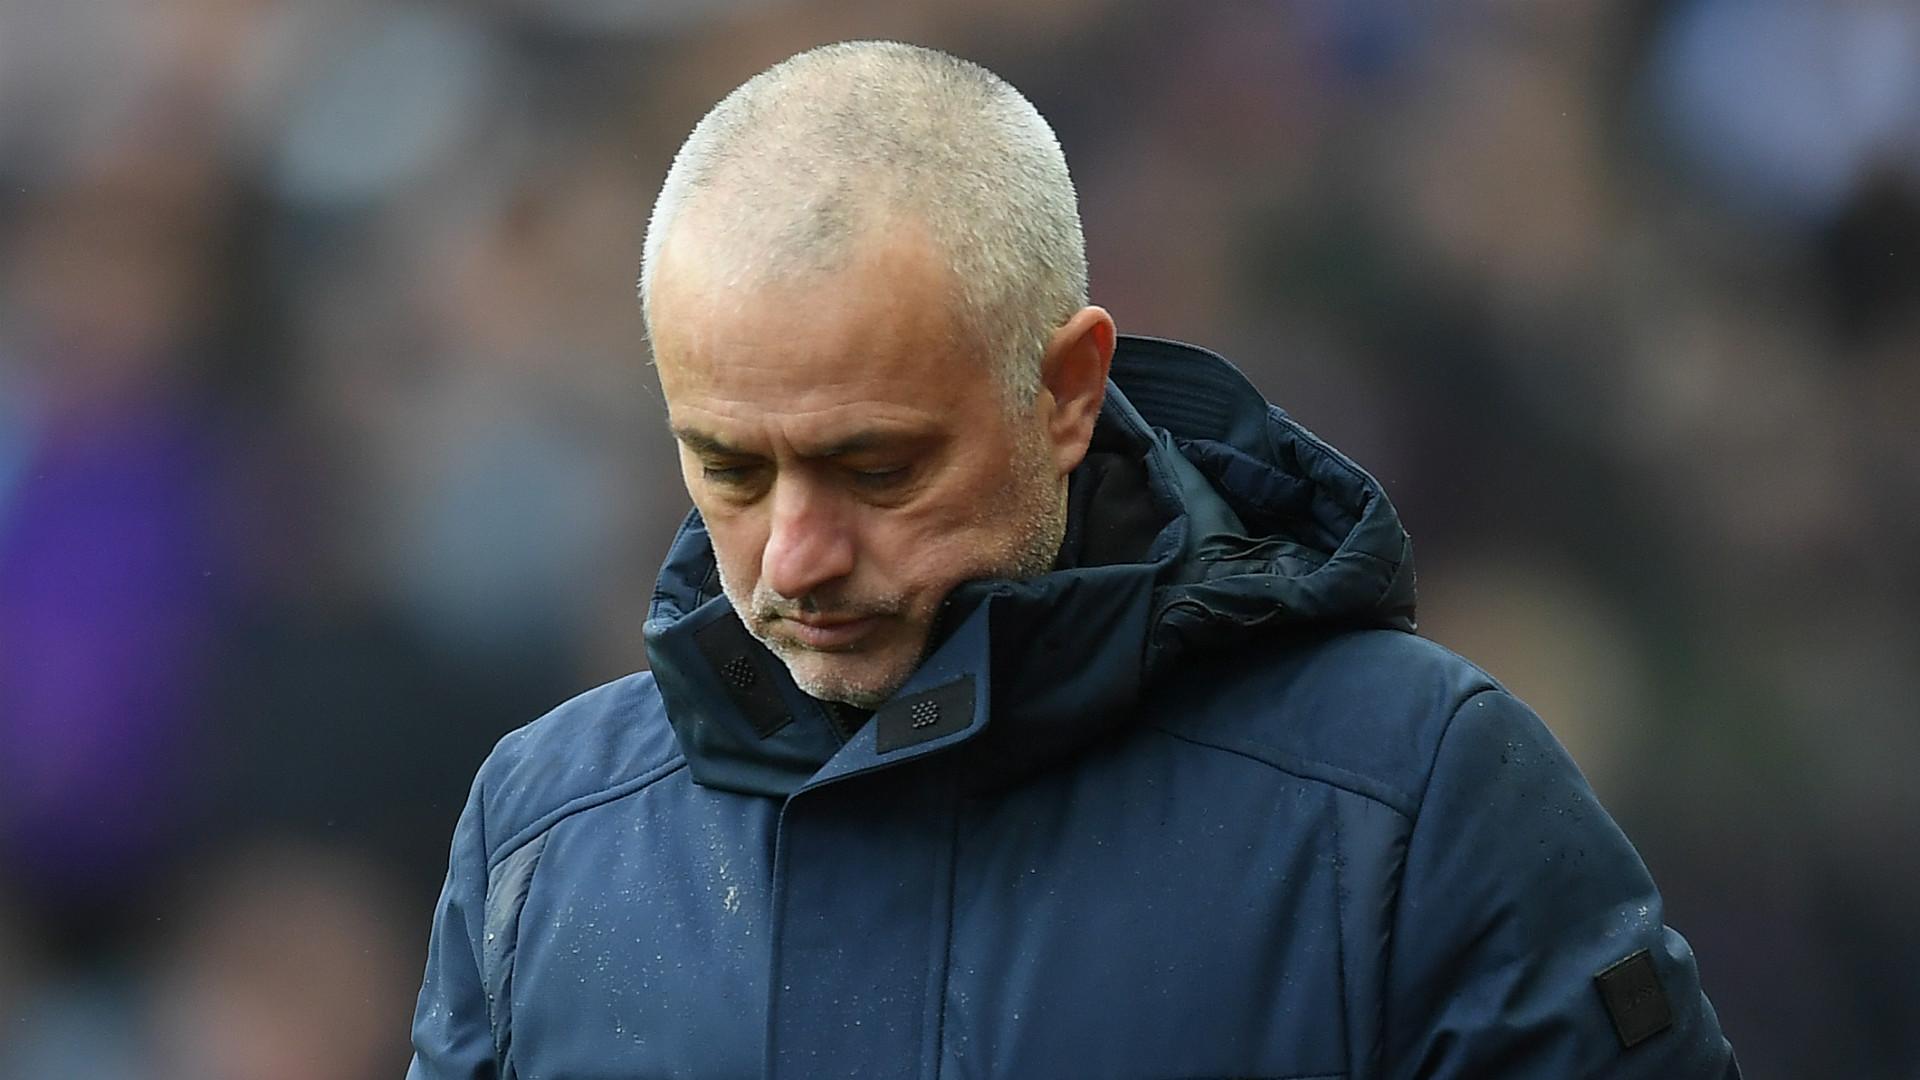 Mourinho's Spurs are not ready to match last season's Champions League achievements